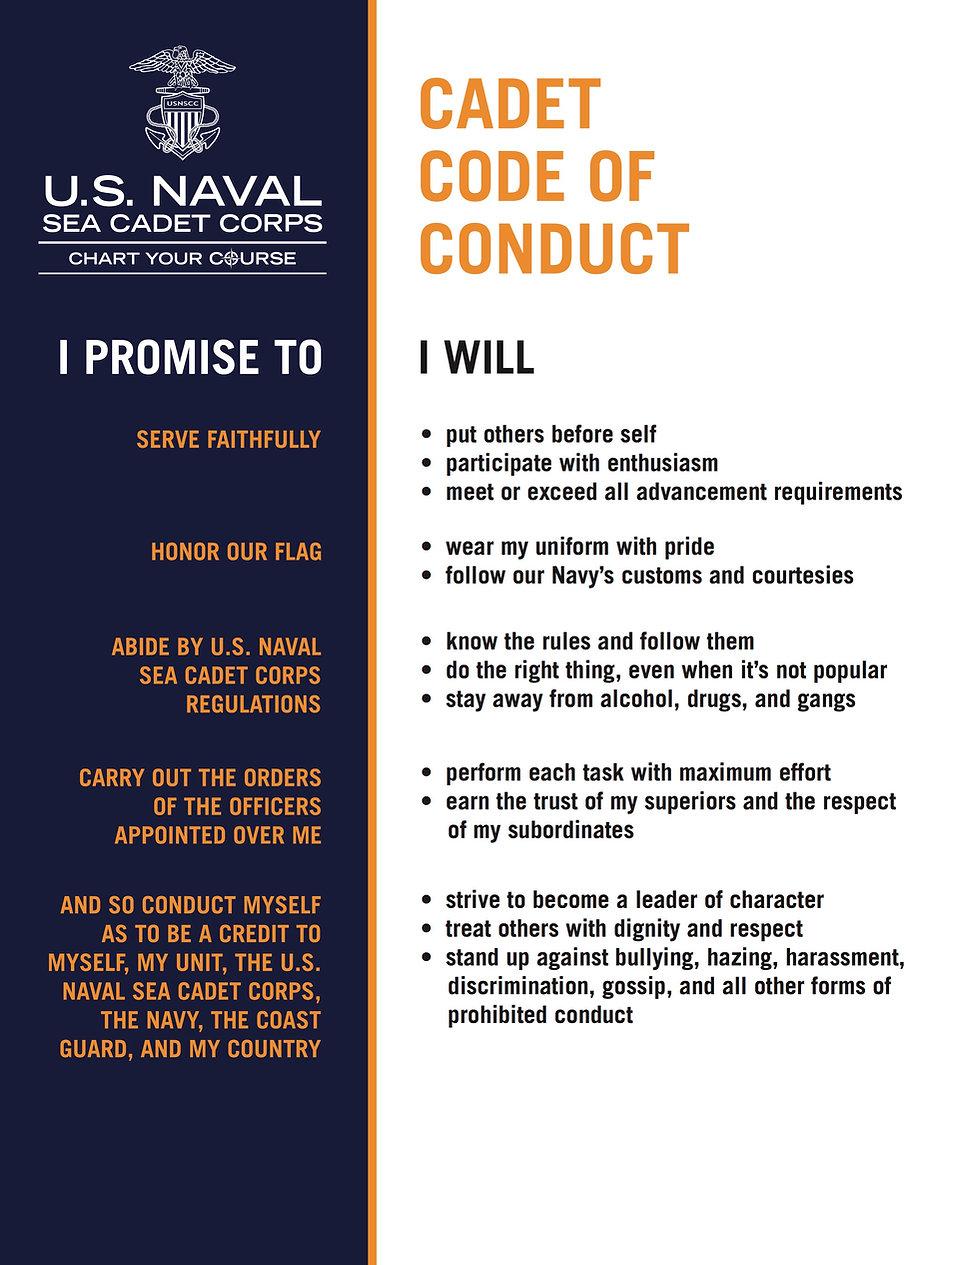 Cadet Code of Conduct.jpg